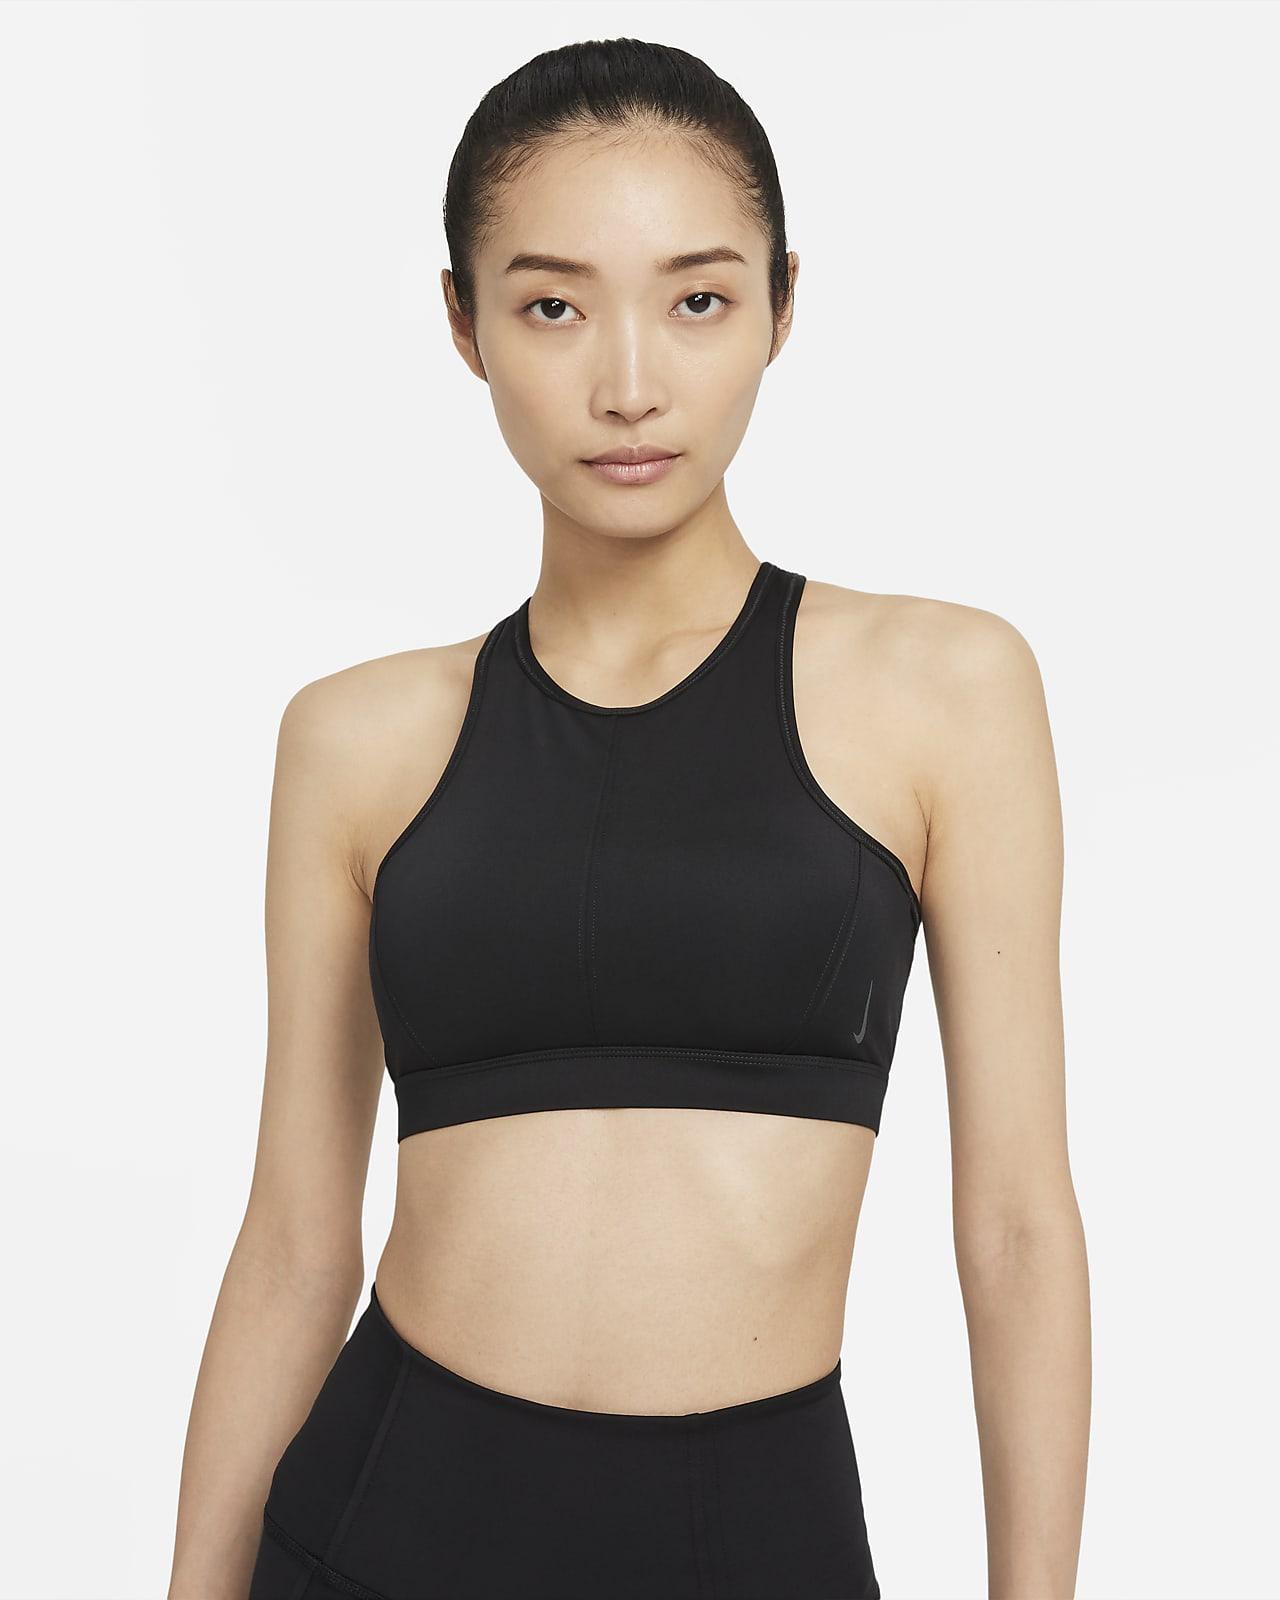 Nike Yoga Dri-FIT Swoosh Women's Medium-Support 1-Piece Pad High-Neck Sports Bra